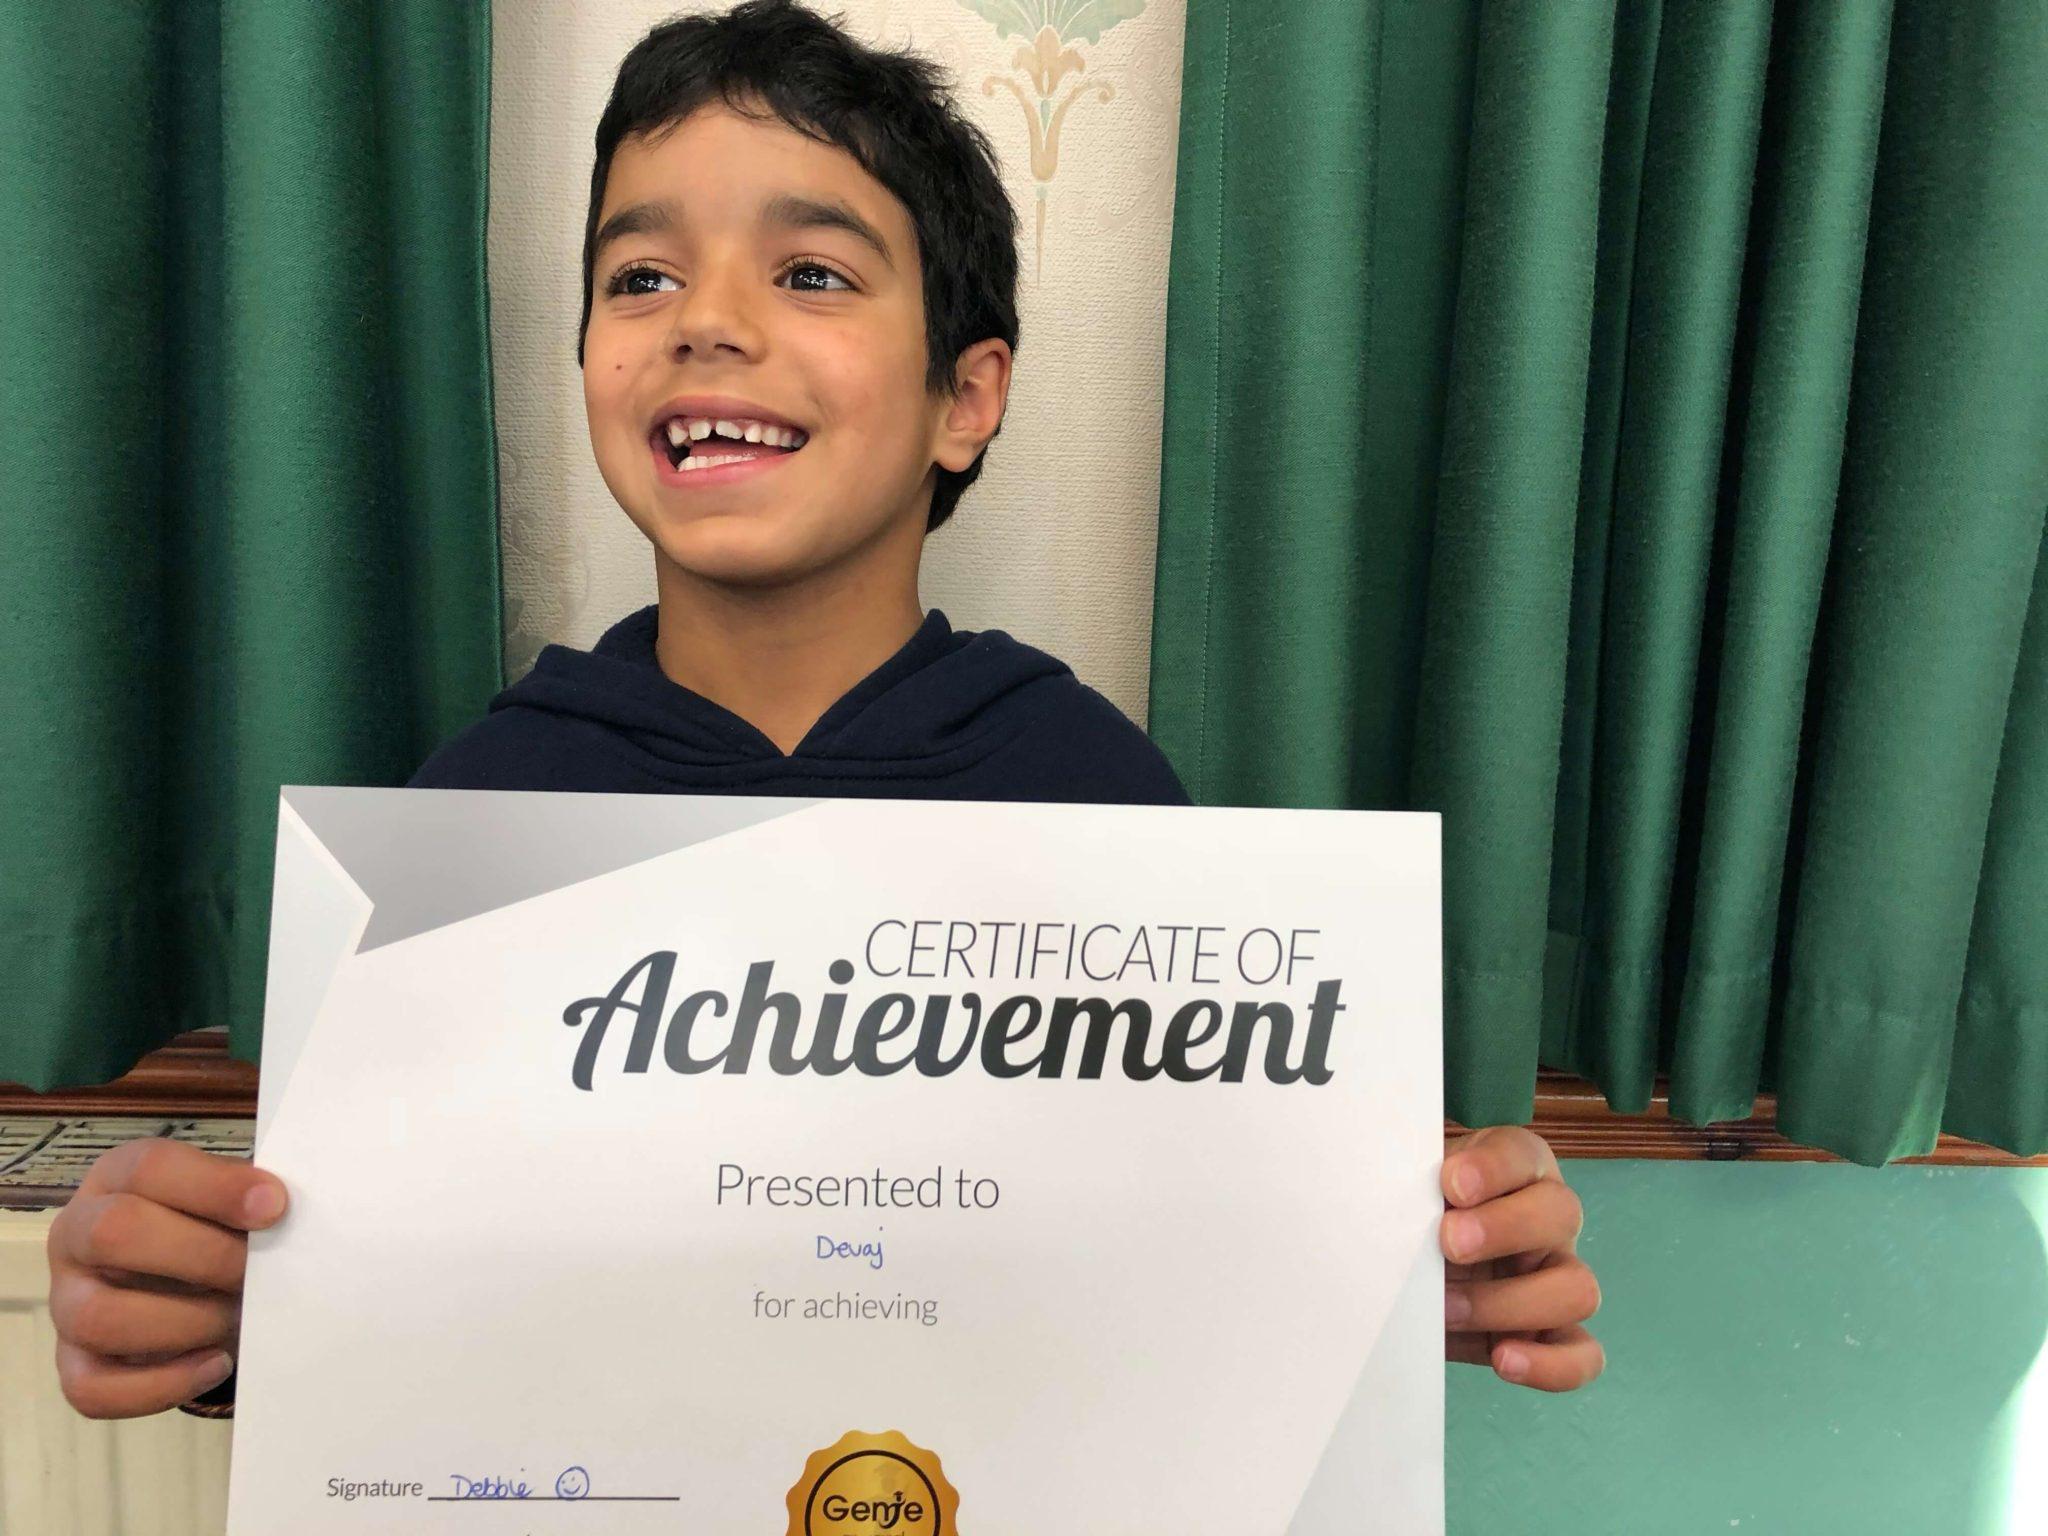 Devaj was presented with certificate for his great progress at Genie Tutors Harborne